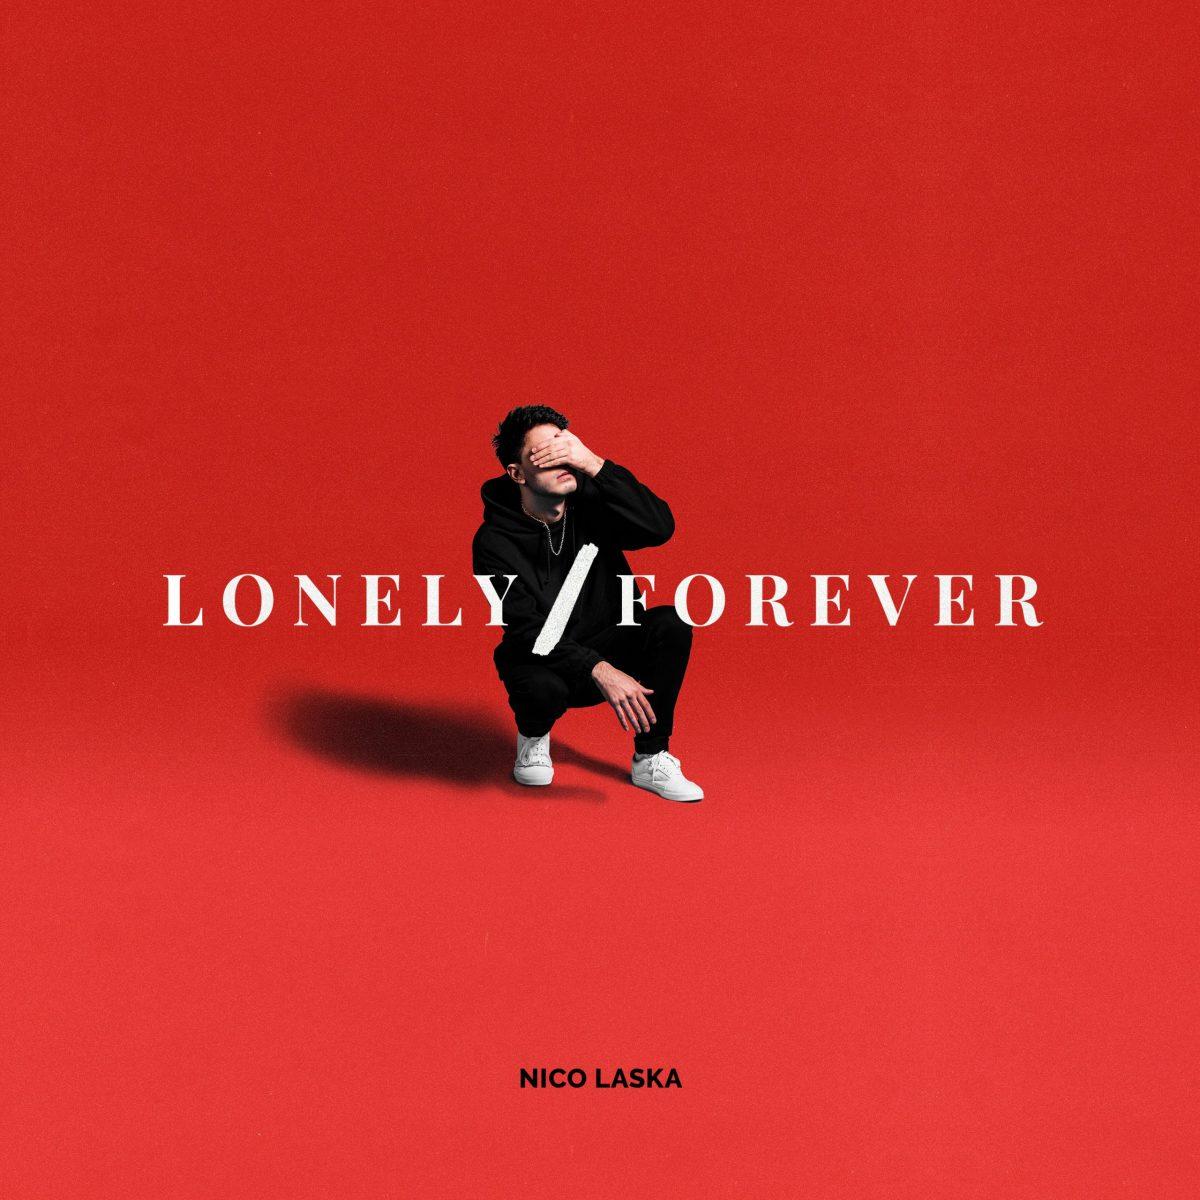 nico-laska-lonely-forever-video-premiere